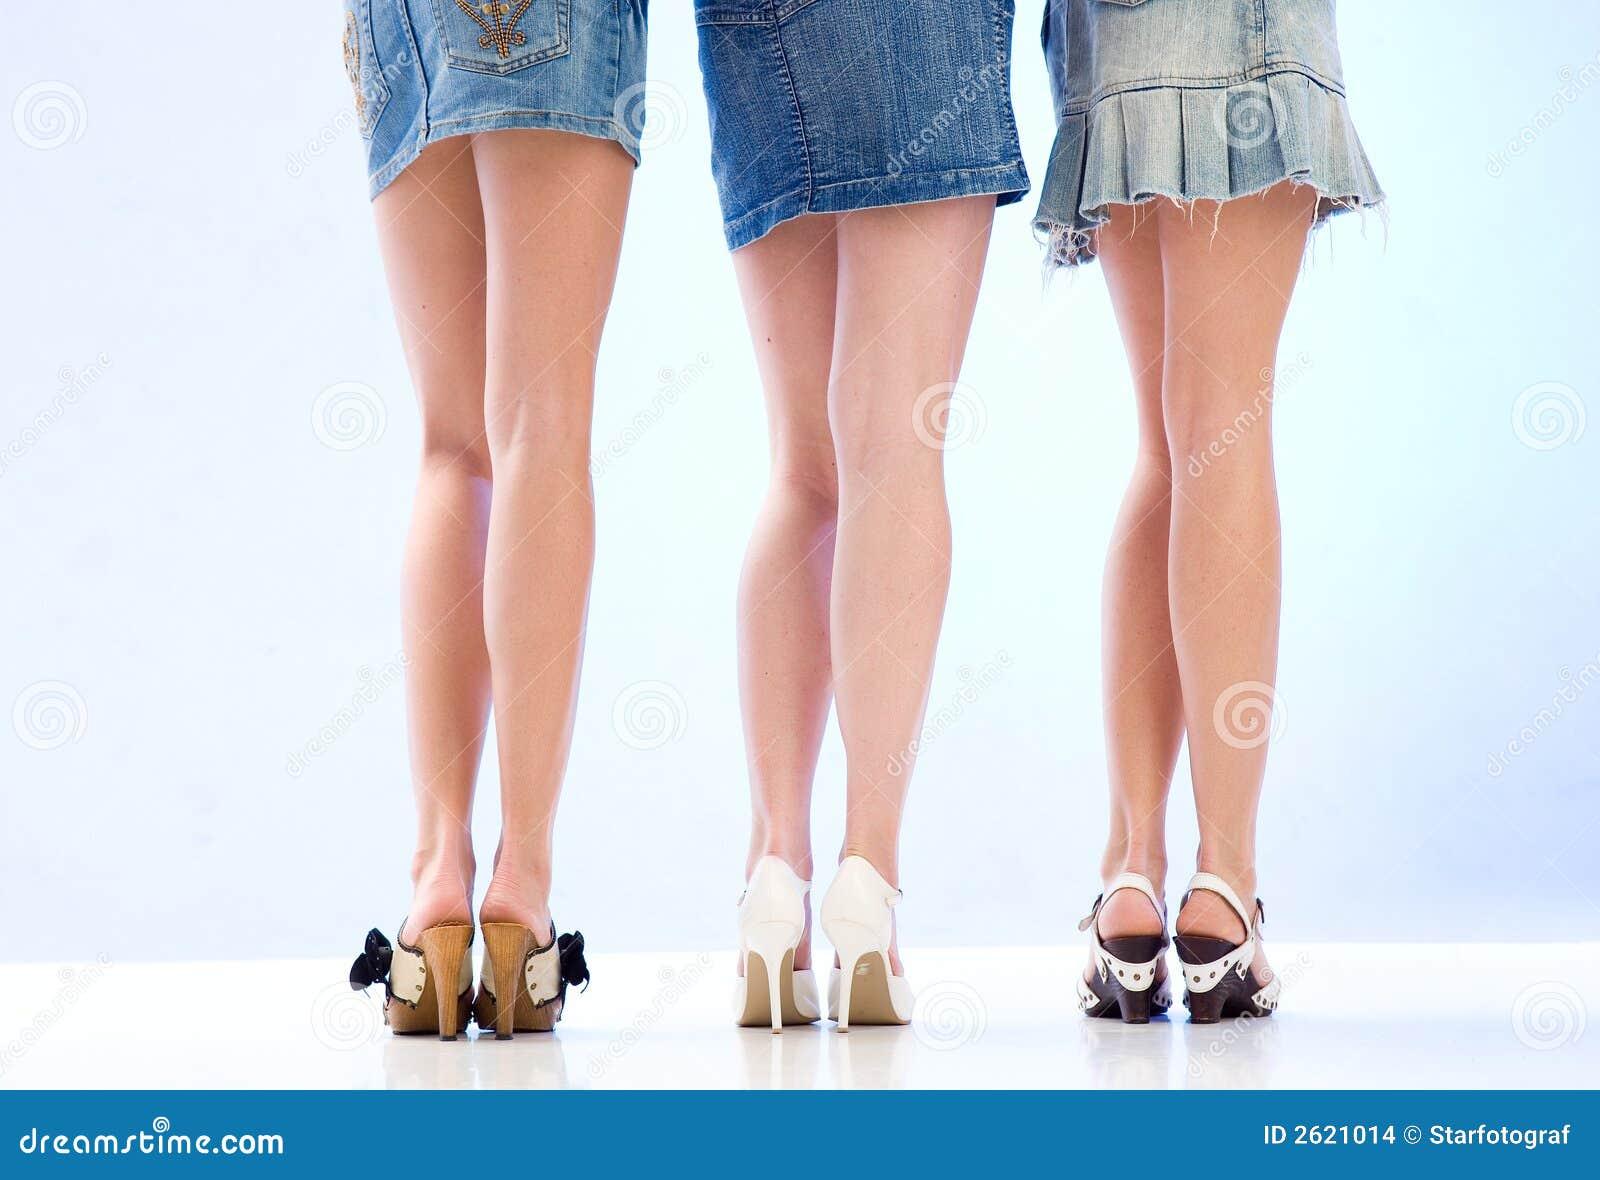 Секс девочки в мини юбке 10 фотография